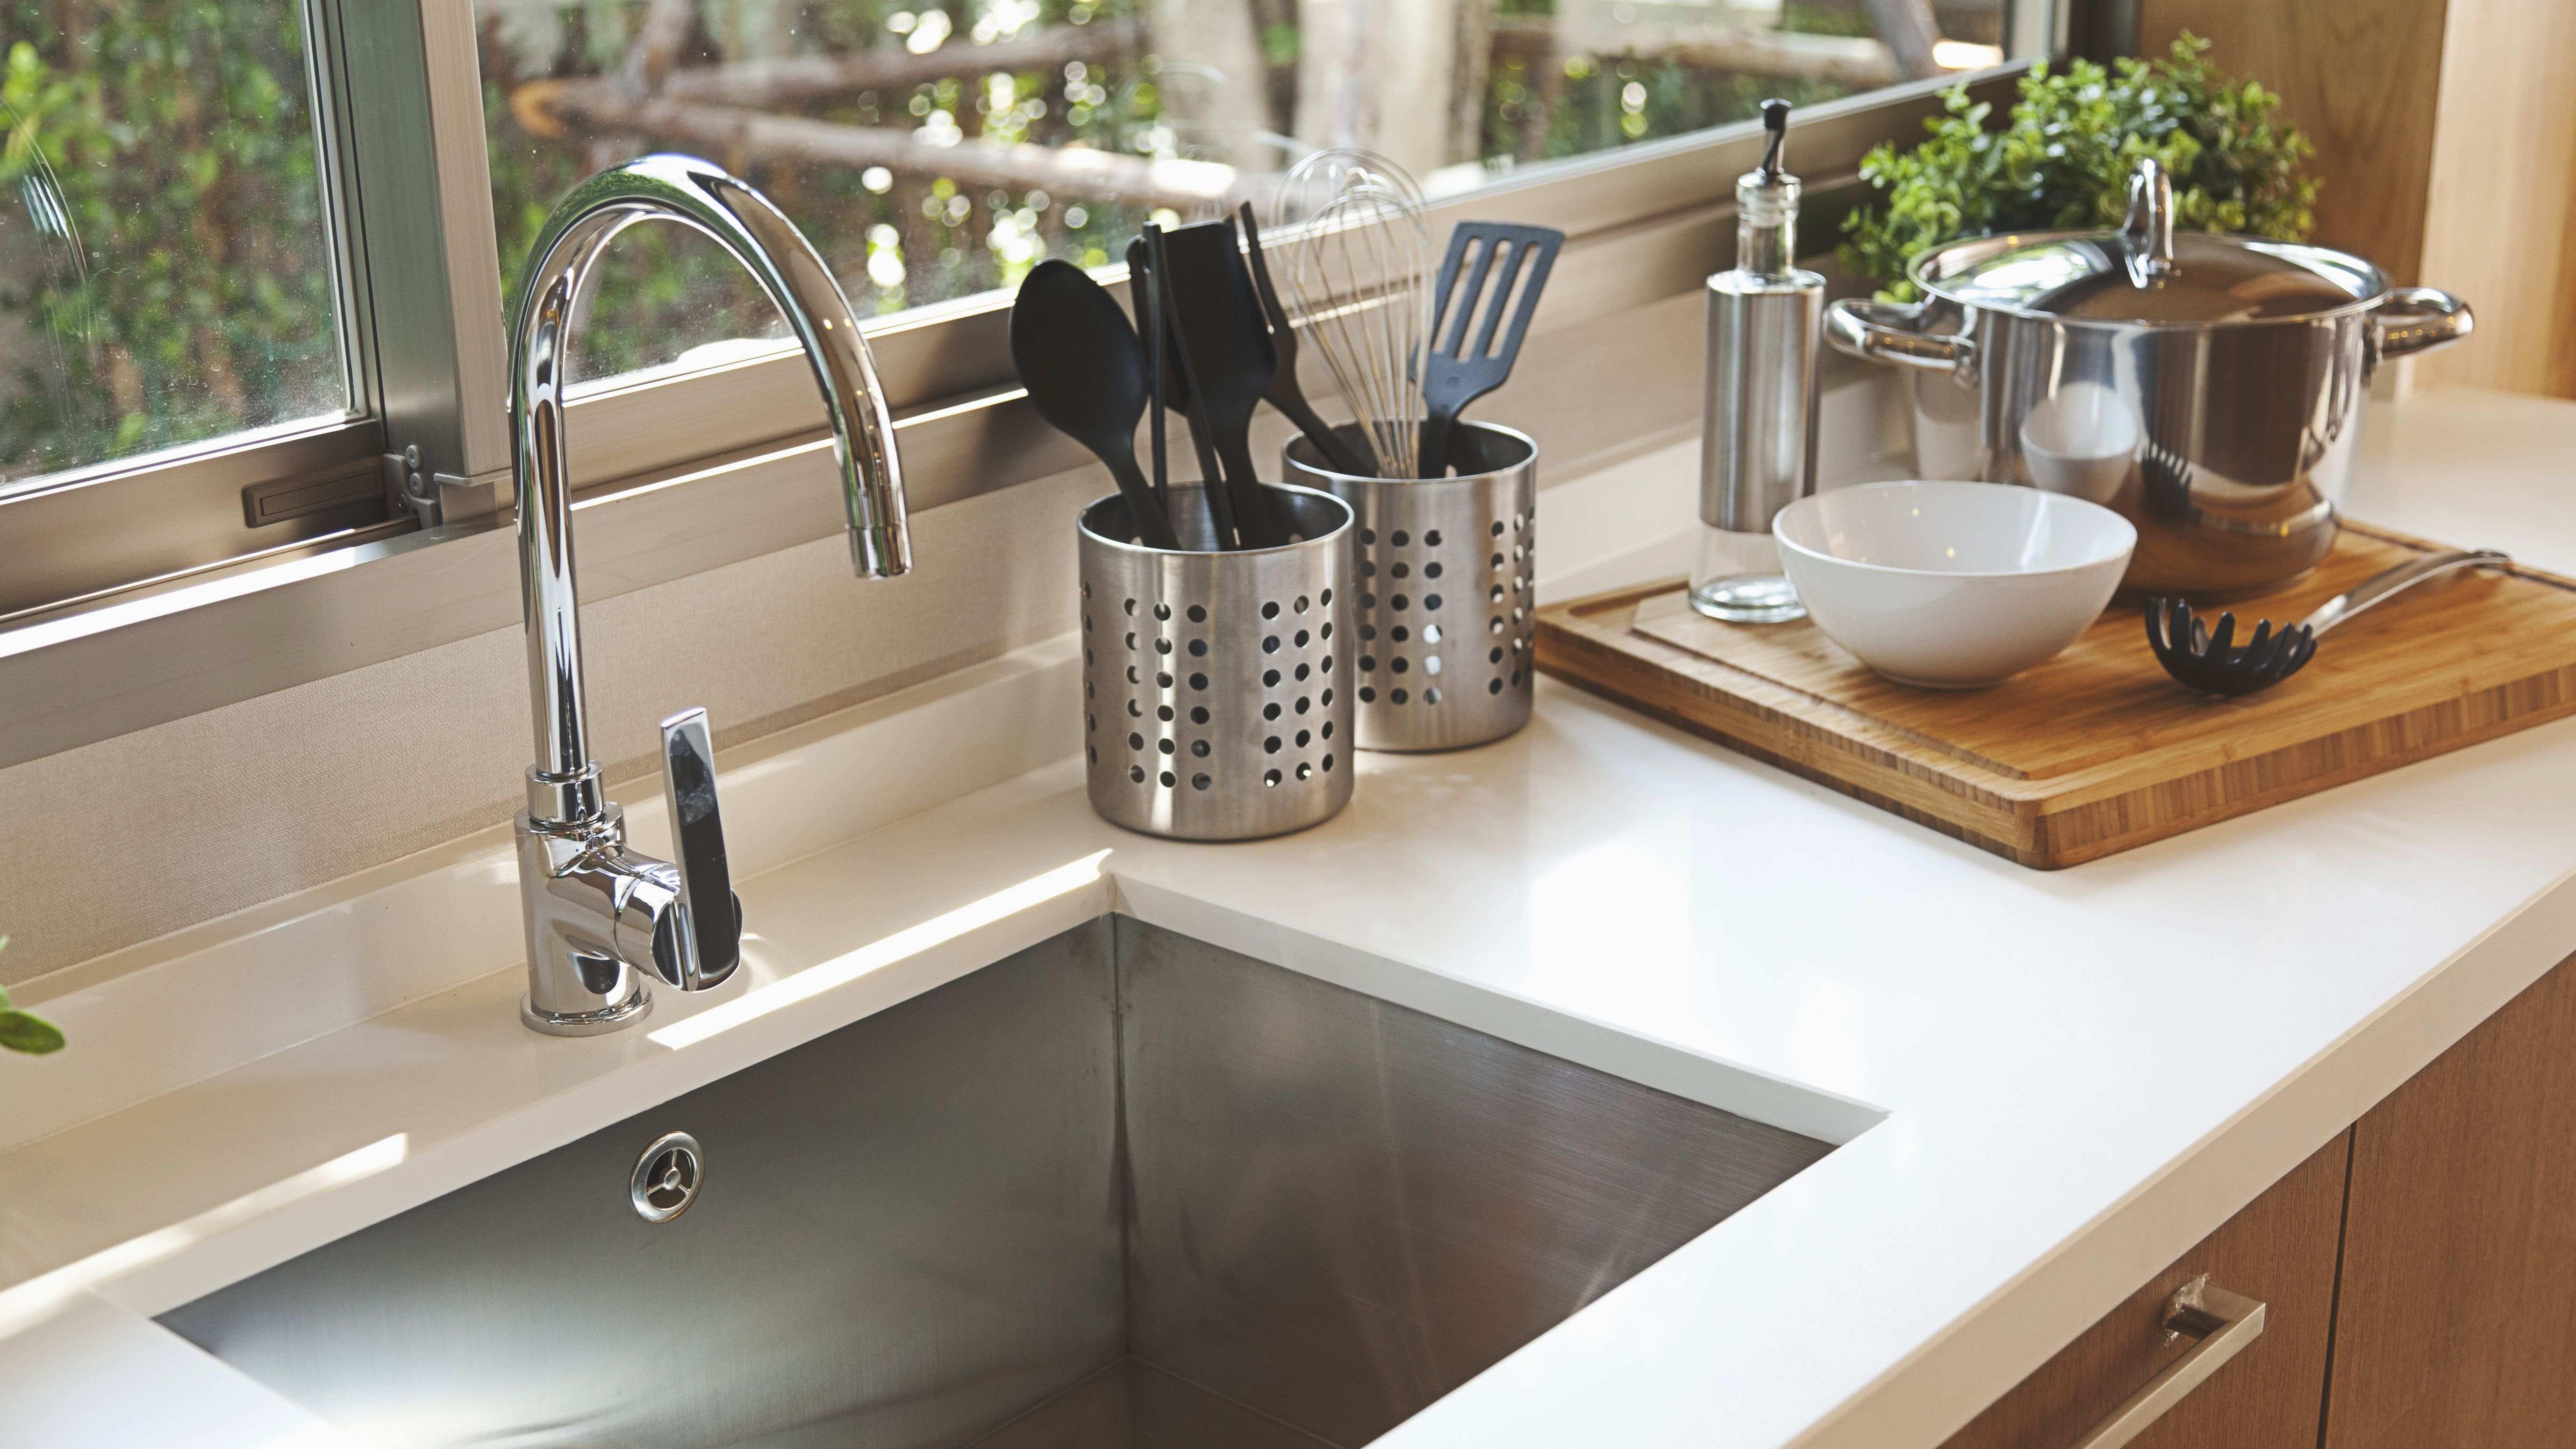 Kitchen sink accessories buying guide